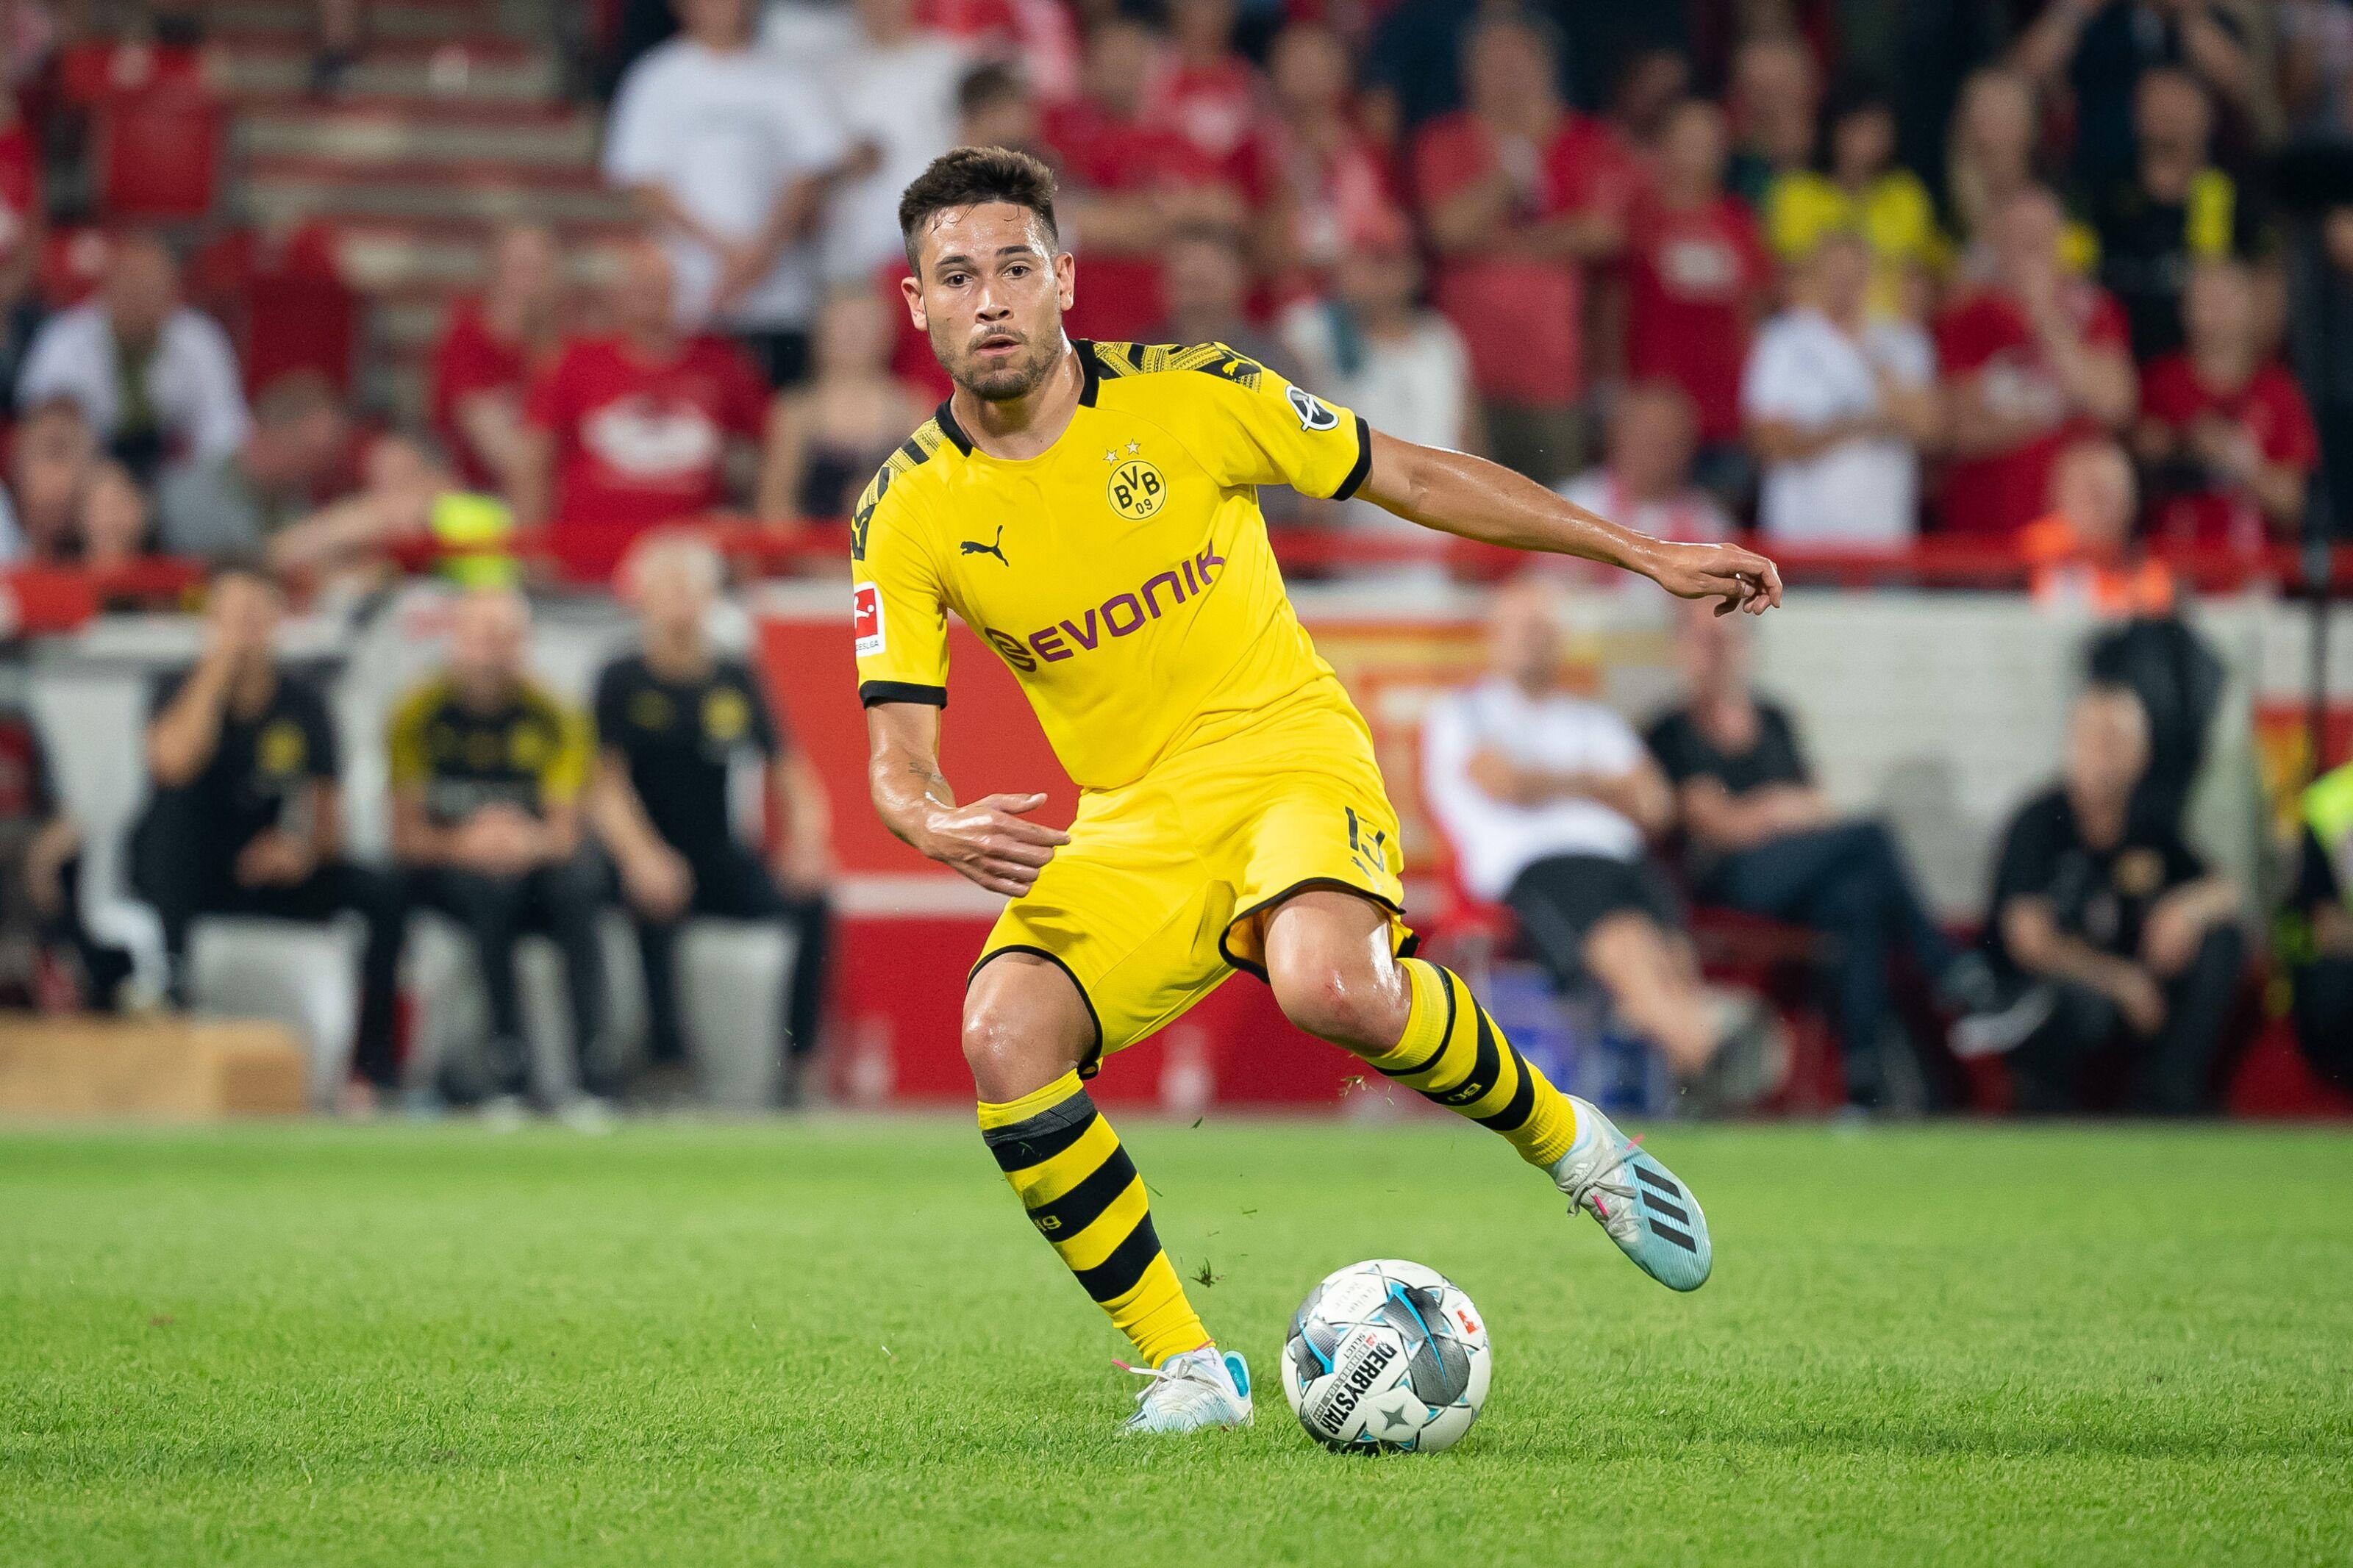 Transfer deadline day roundup: Raphael Guerreiro set for new Borussia Dortmund contract, Marius Wolf to join Hertha Berlin